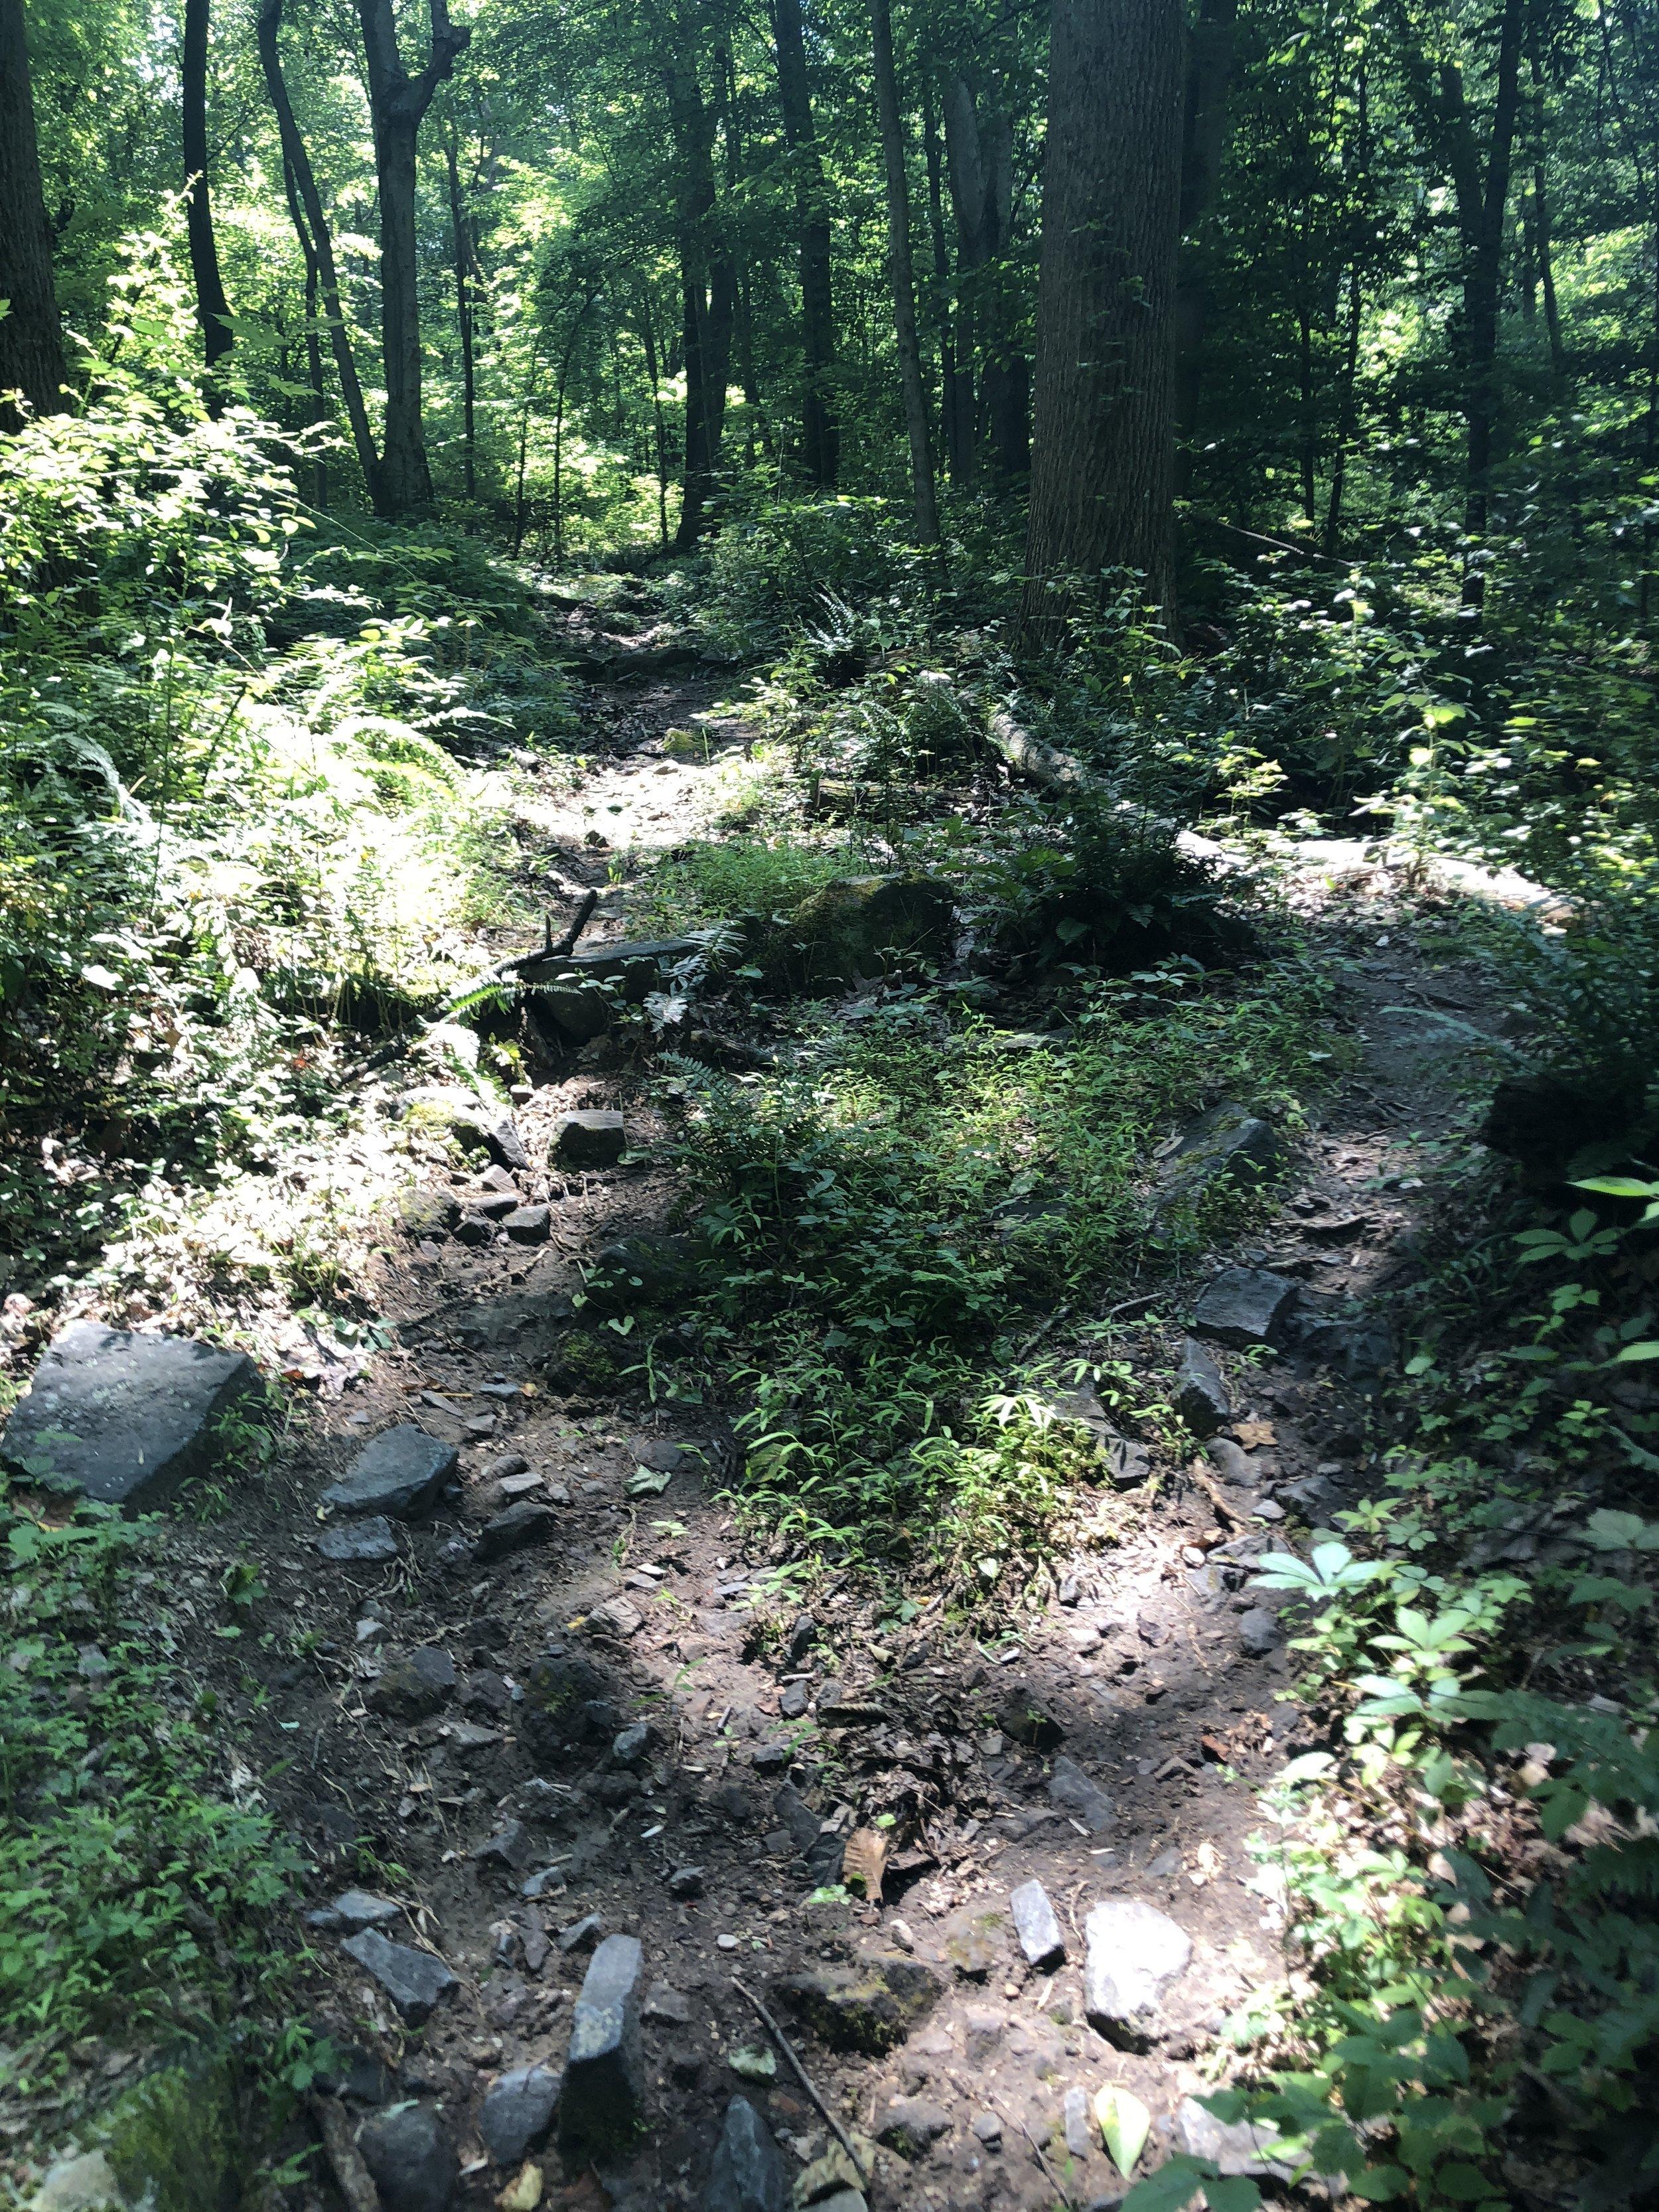 Steep mountain bike trail uphill with ROCKS!